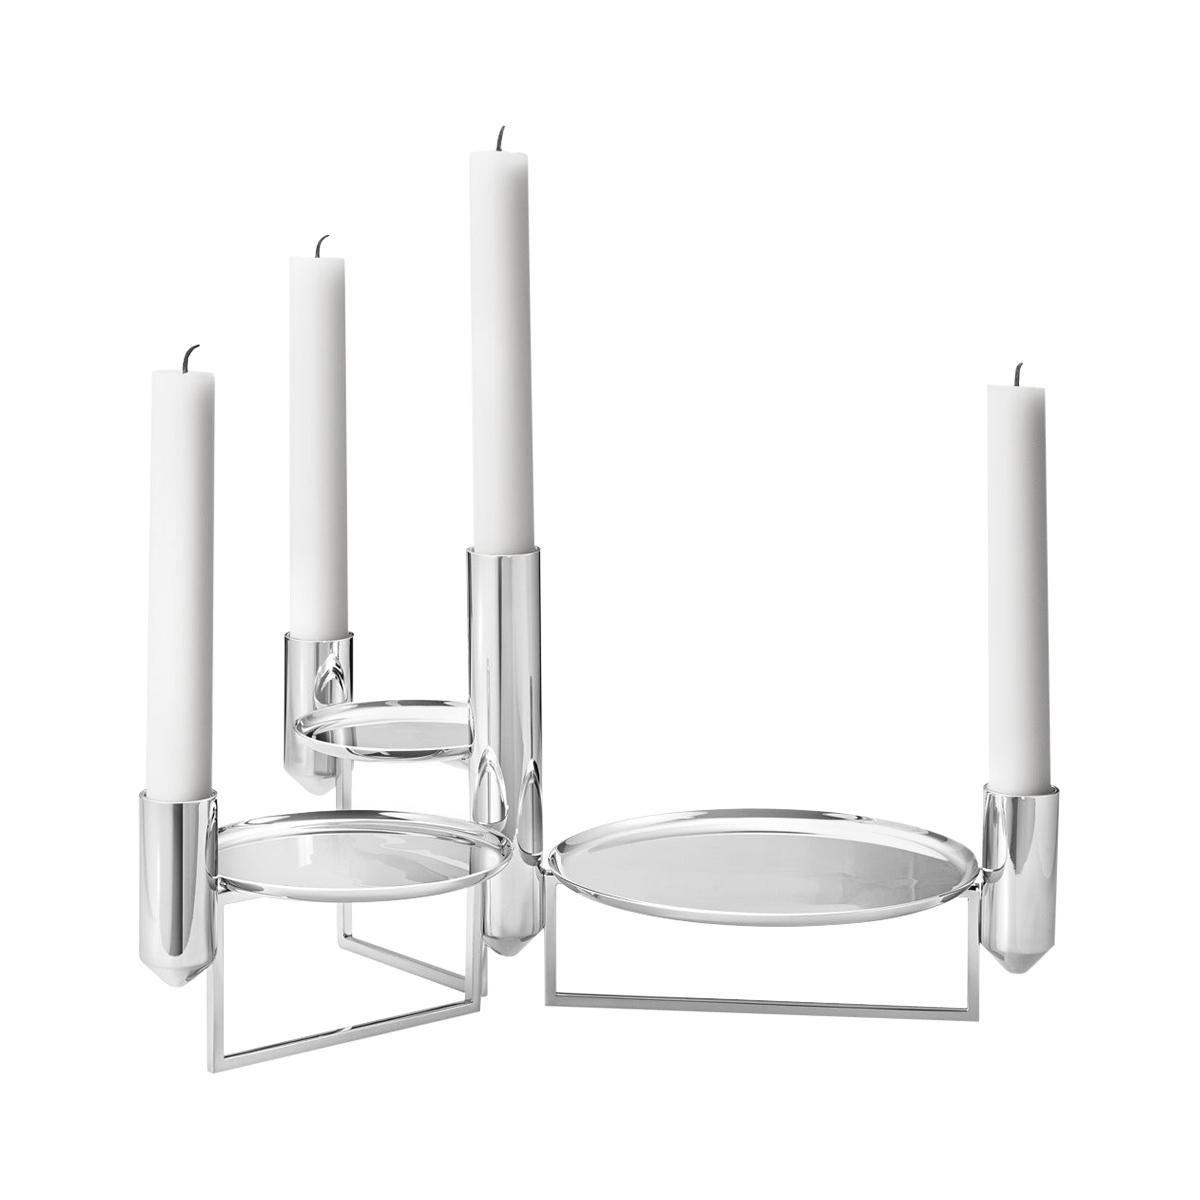 Georg Jensen Tunes Centrepiece Candleholder in Stainless Steel by Monica Förster